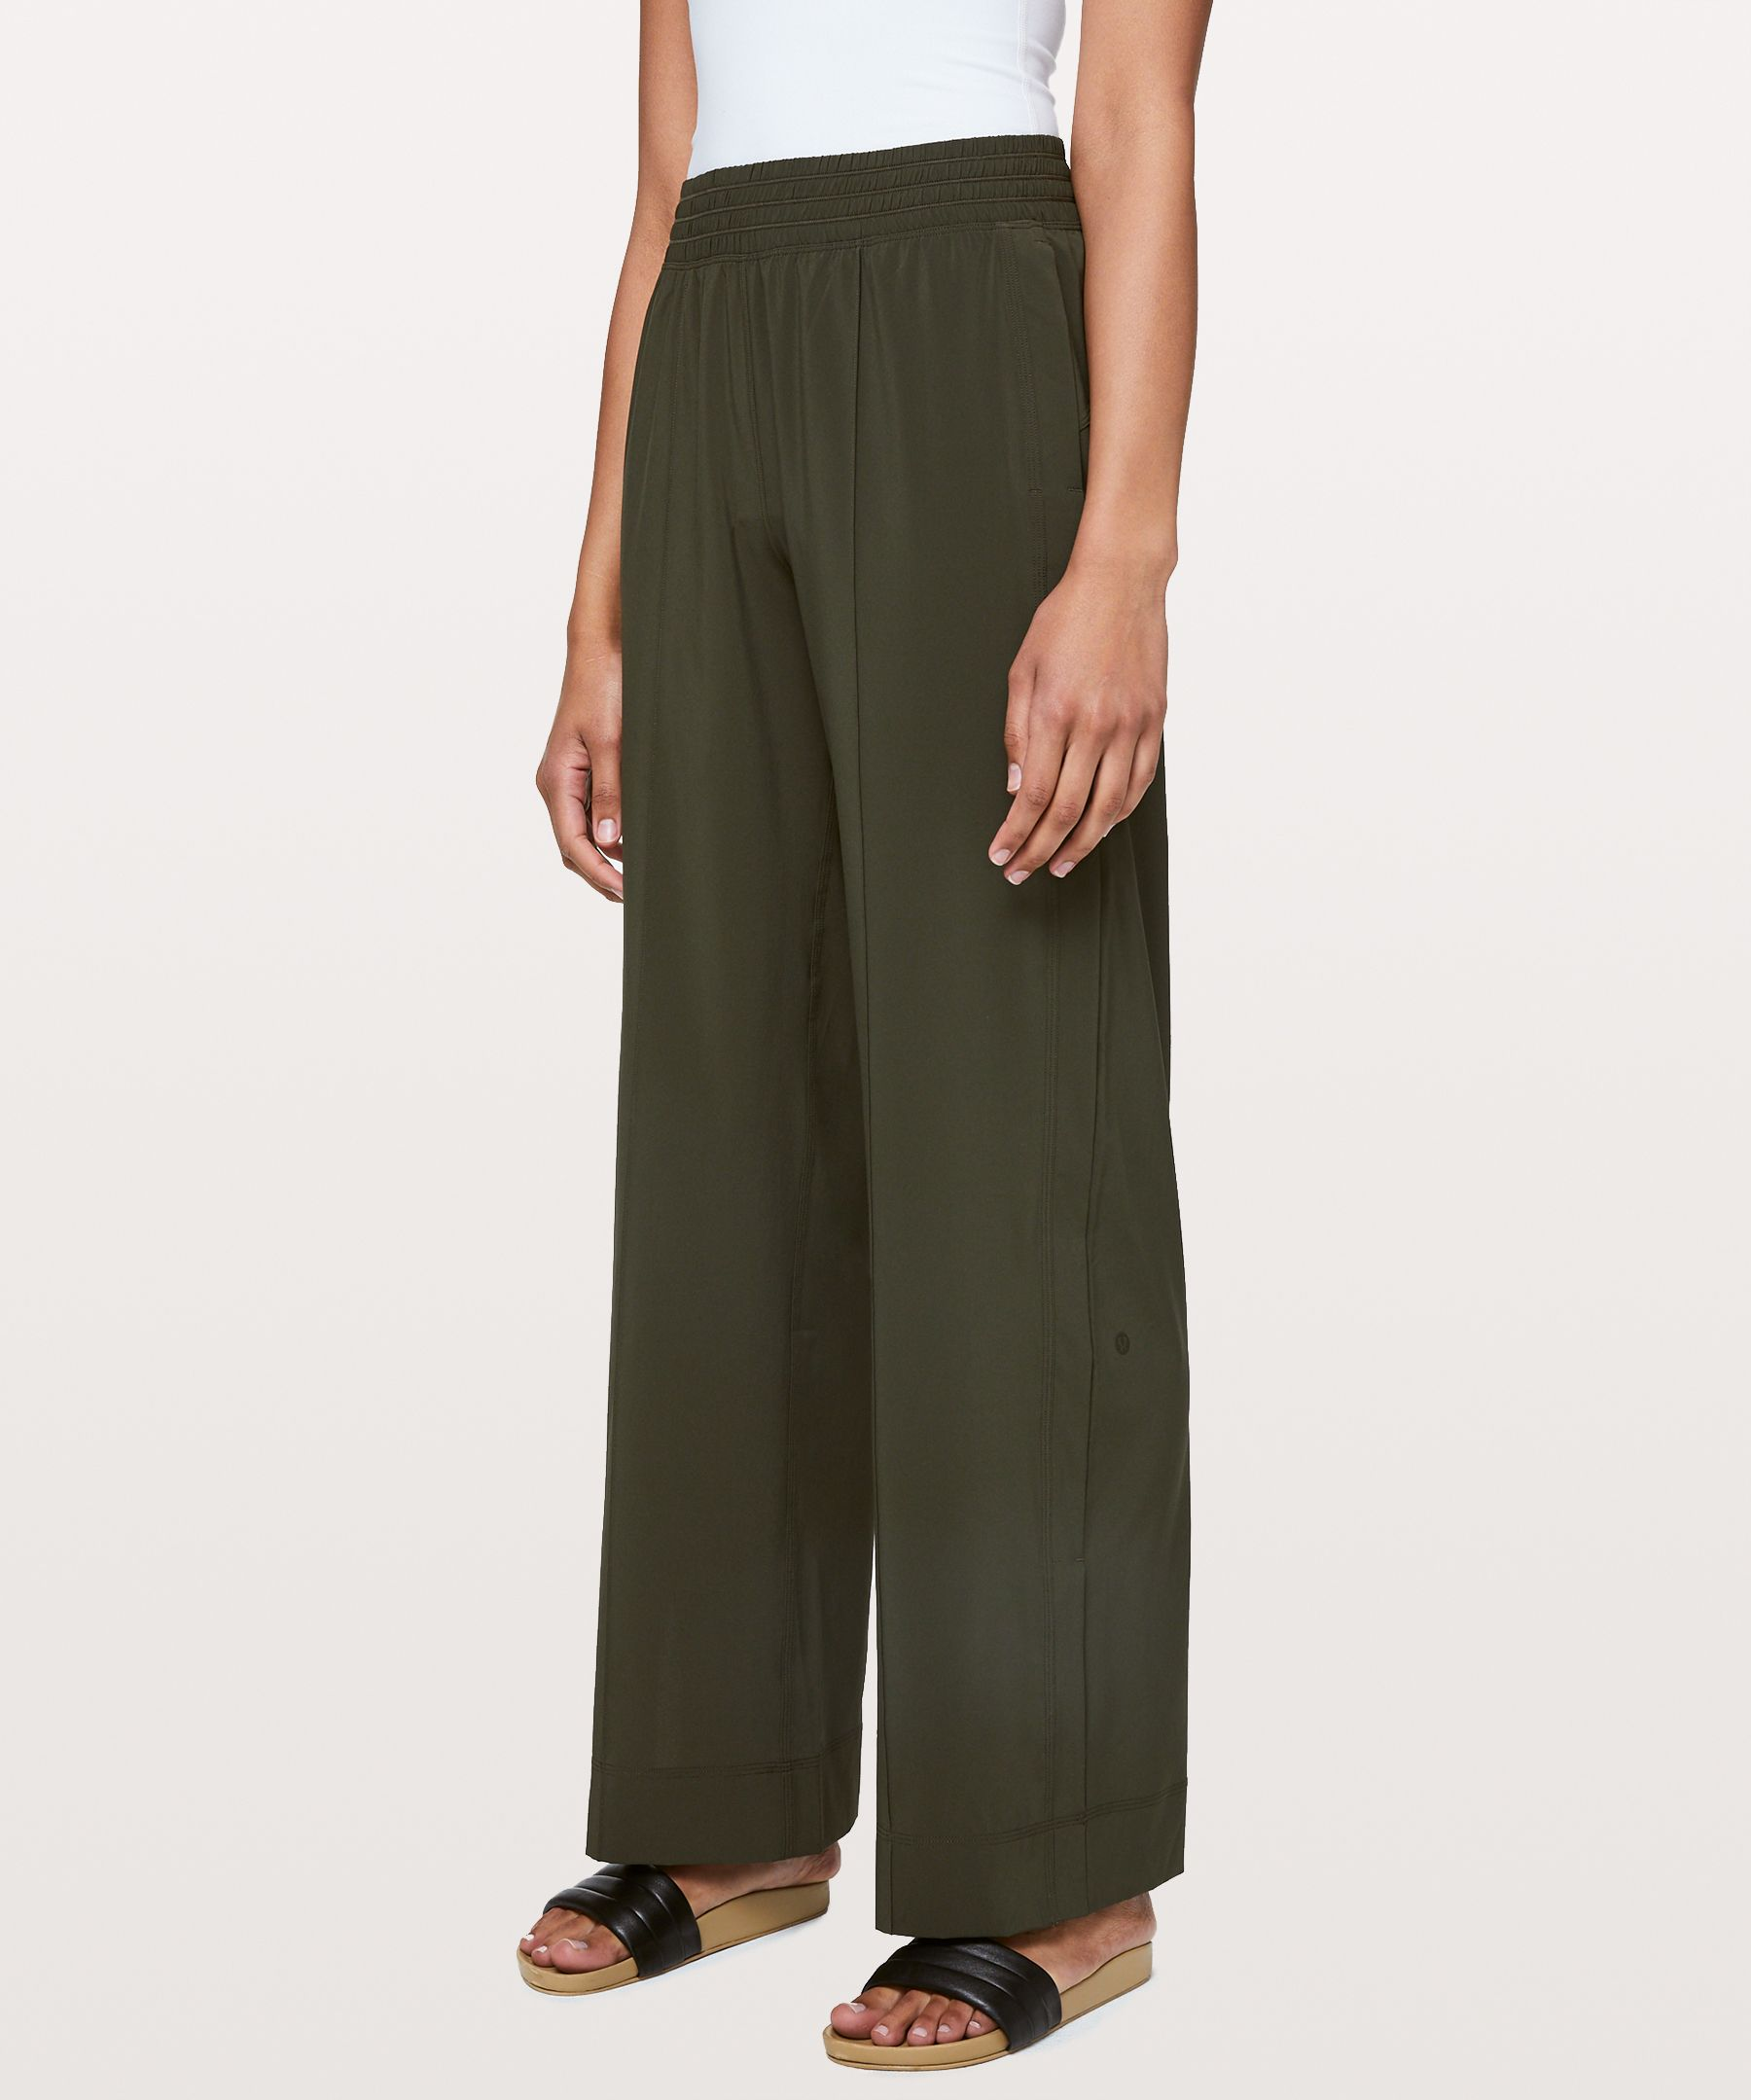 Lululemon Wanderer Wide Leg Pant In Dark Olive